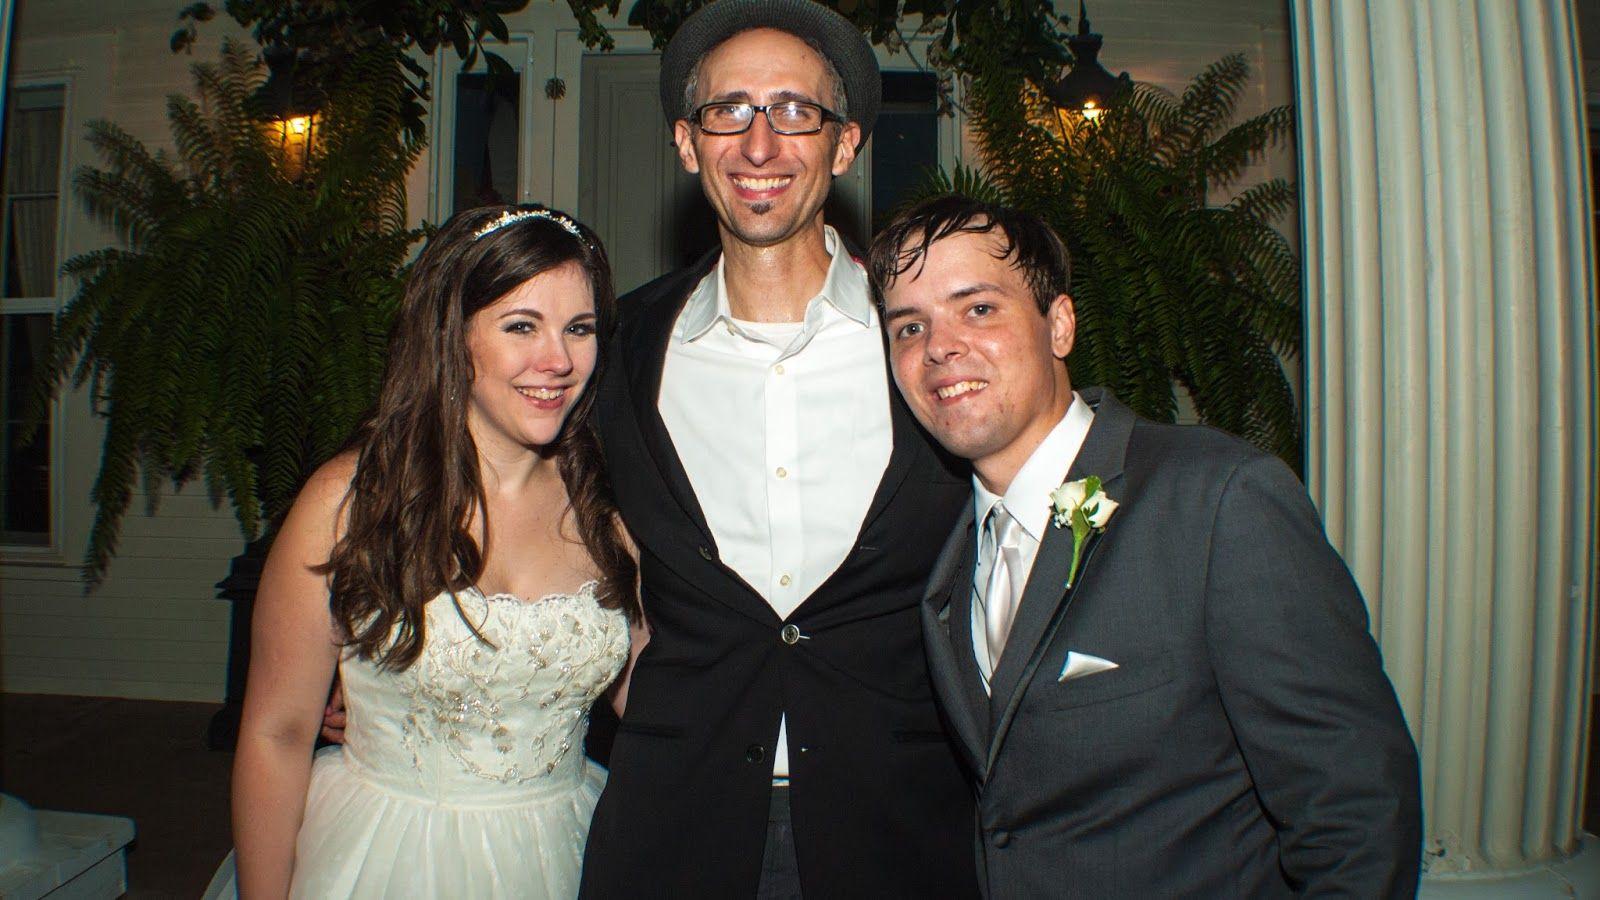 www.WithClassLLC.com - Wedding Ceremony & Reception Venue: Creekside Plantation - Mooresville, AL - w/DJ Mark and Michael and Lexi Hamby 8-27-16